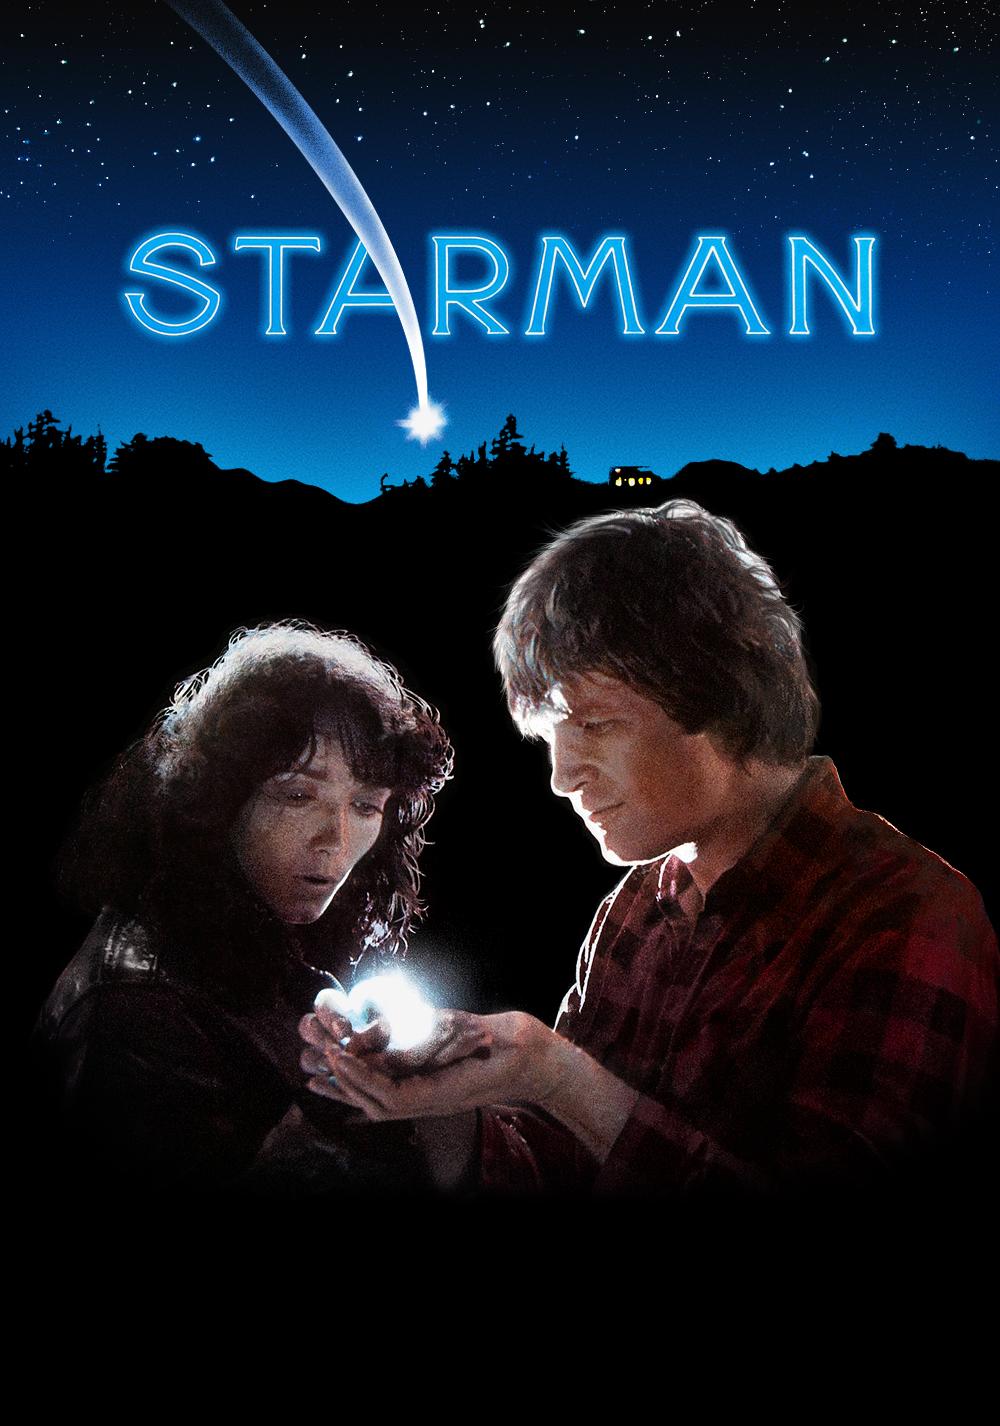 Starman Film